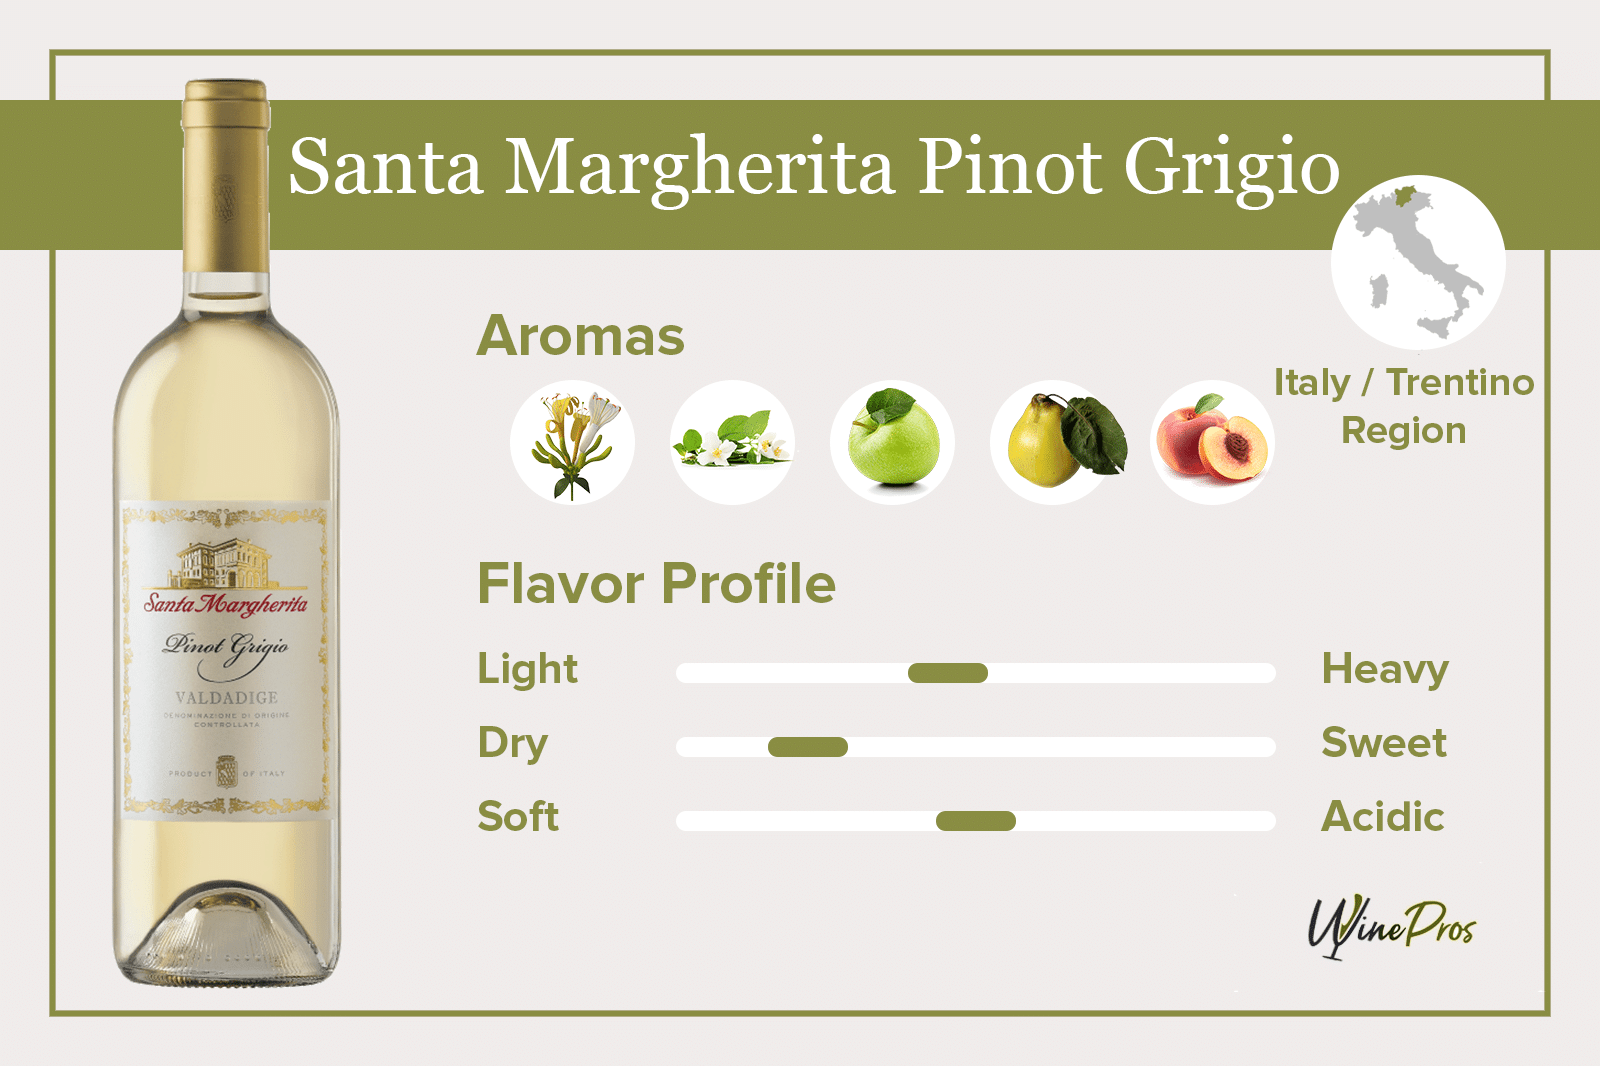 Santa Margherita Pinot Grigio Review – Valdadige (2021)